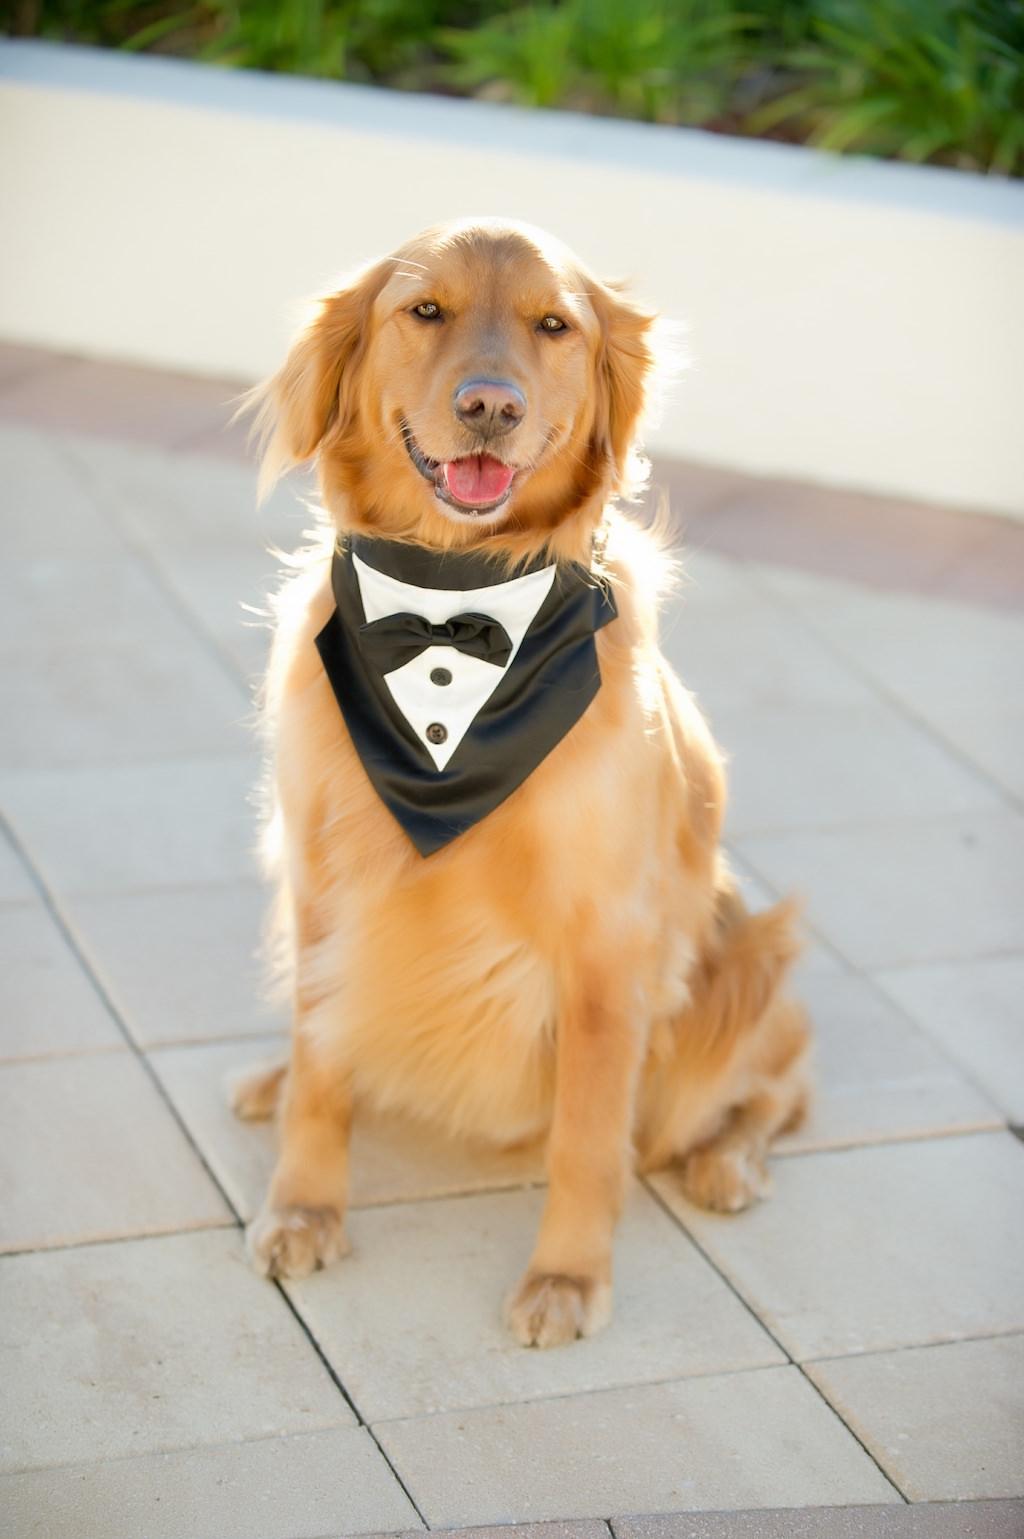 Dog of Honor Wedding Pet Portrait wearing Tuxedo Collar | Tampa Bay Wedding Photographer Andi Diamond Photography | Tampa Wedding Pet Coordinator and Planner FairyTail Pet Care